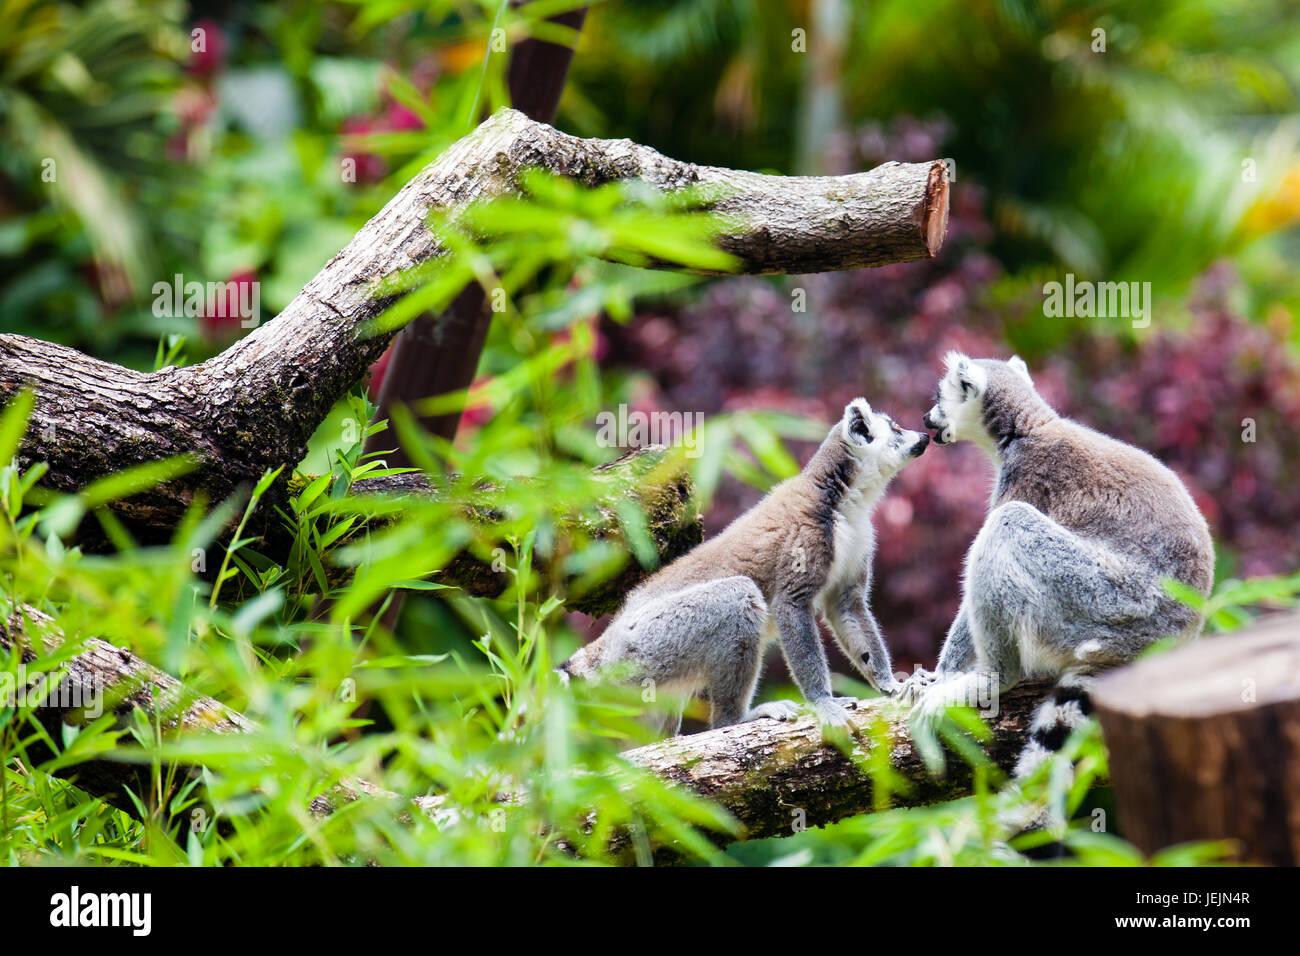 Ring-tailed lemur (Lemur catta) in captivity - Stock Image